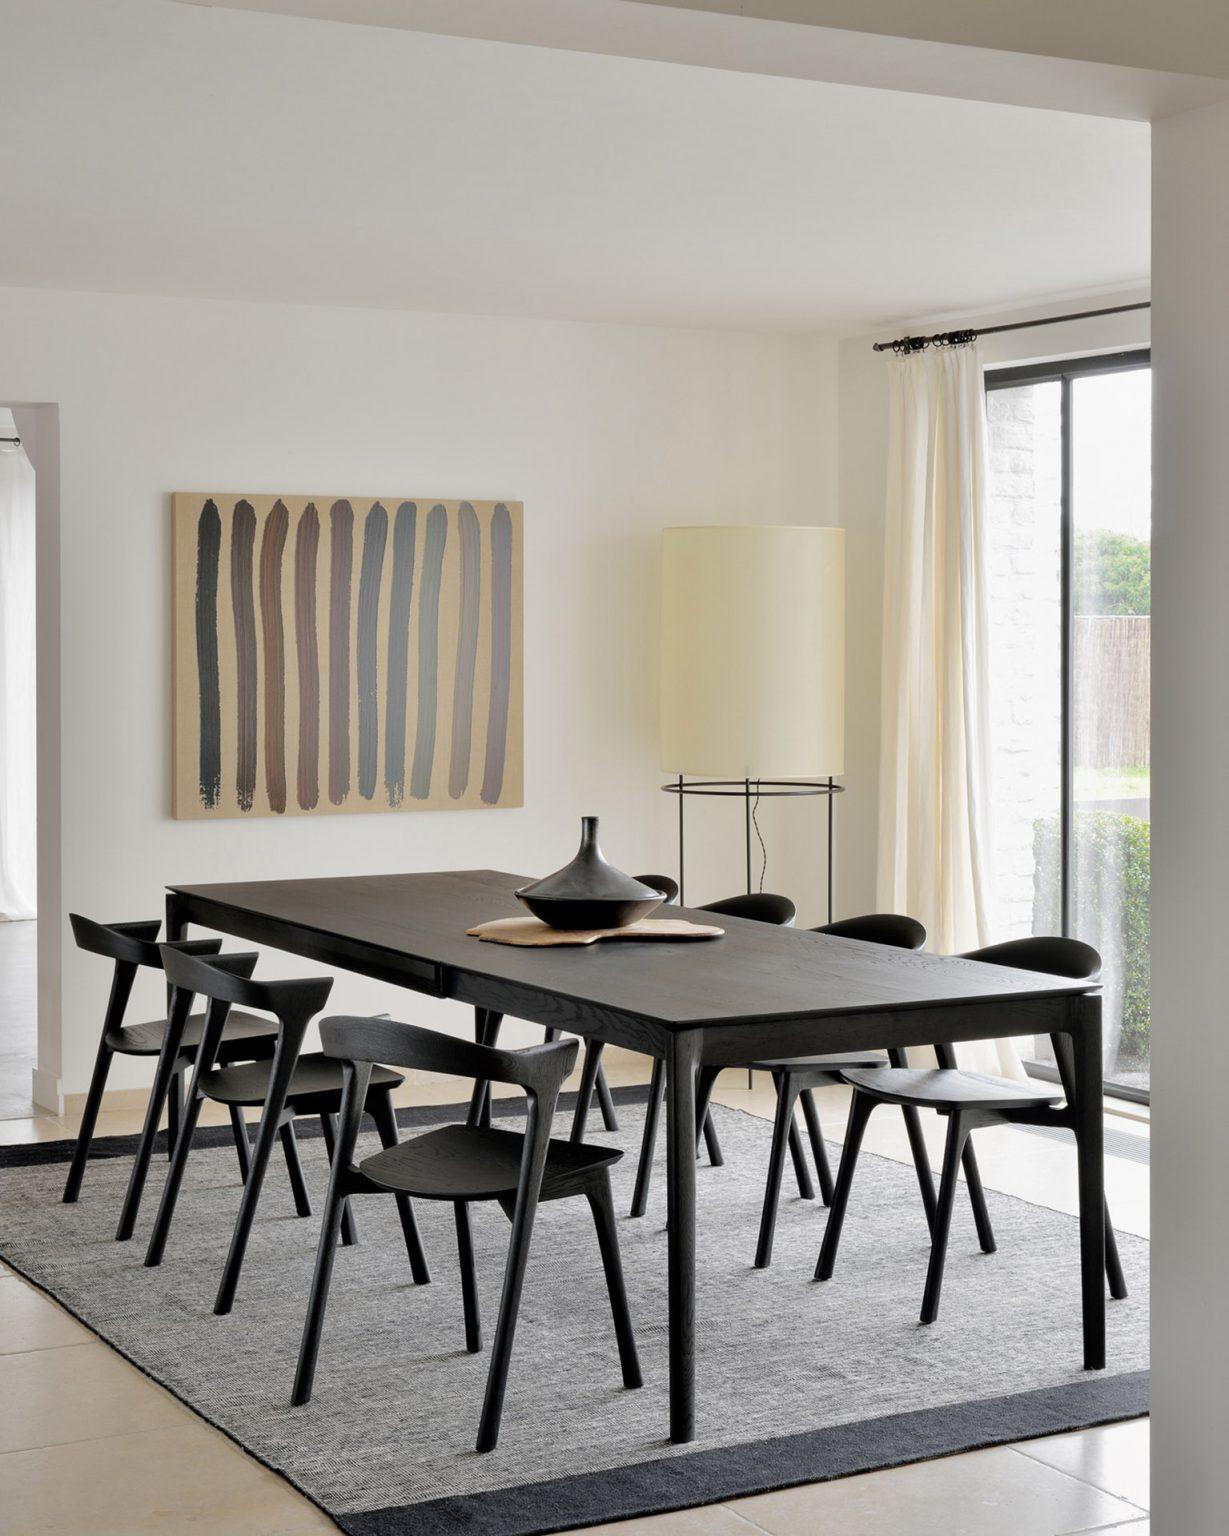 Biennale Interieur - Belgium's leading design and interior event - 51544_51491_oak_black_bok_extendable_dining_table_chair_21720_black_dots_kilim_rug_1_web.jpg